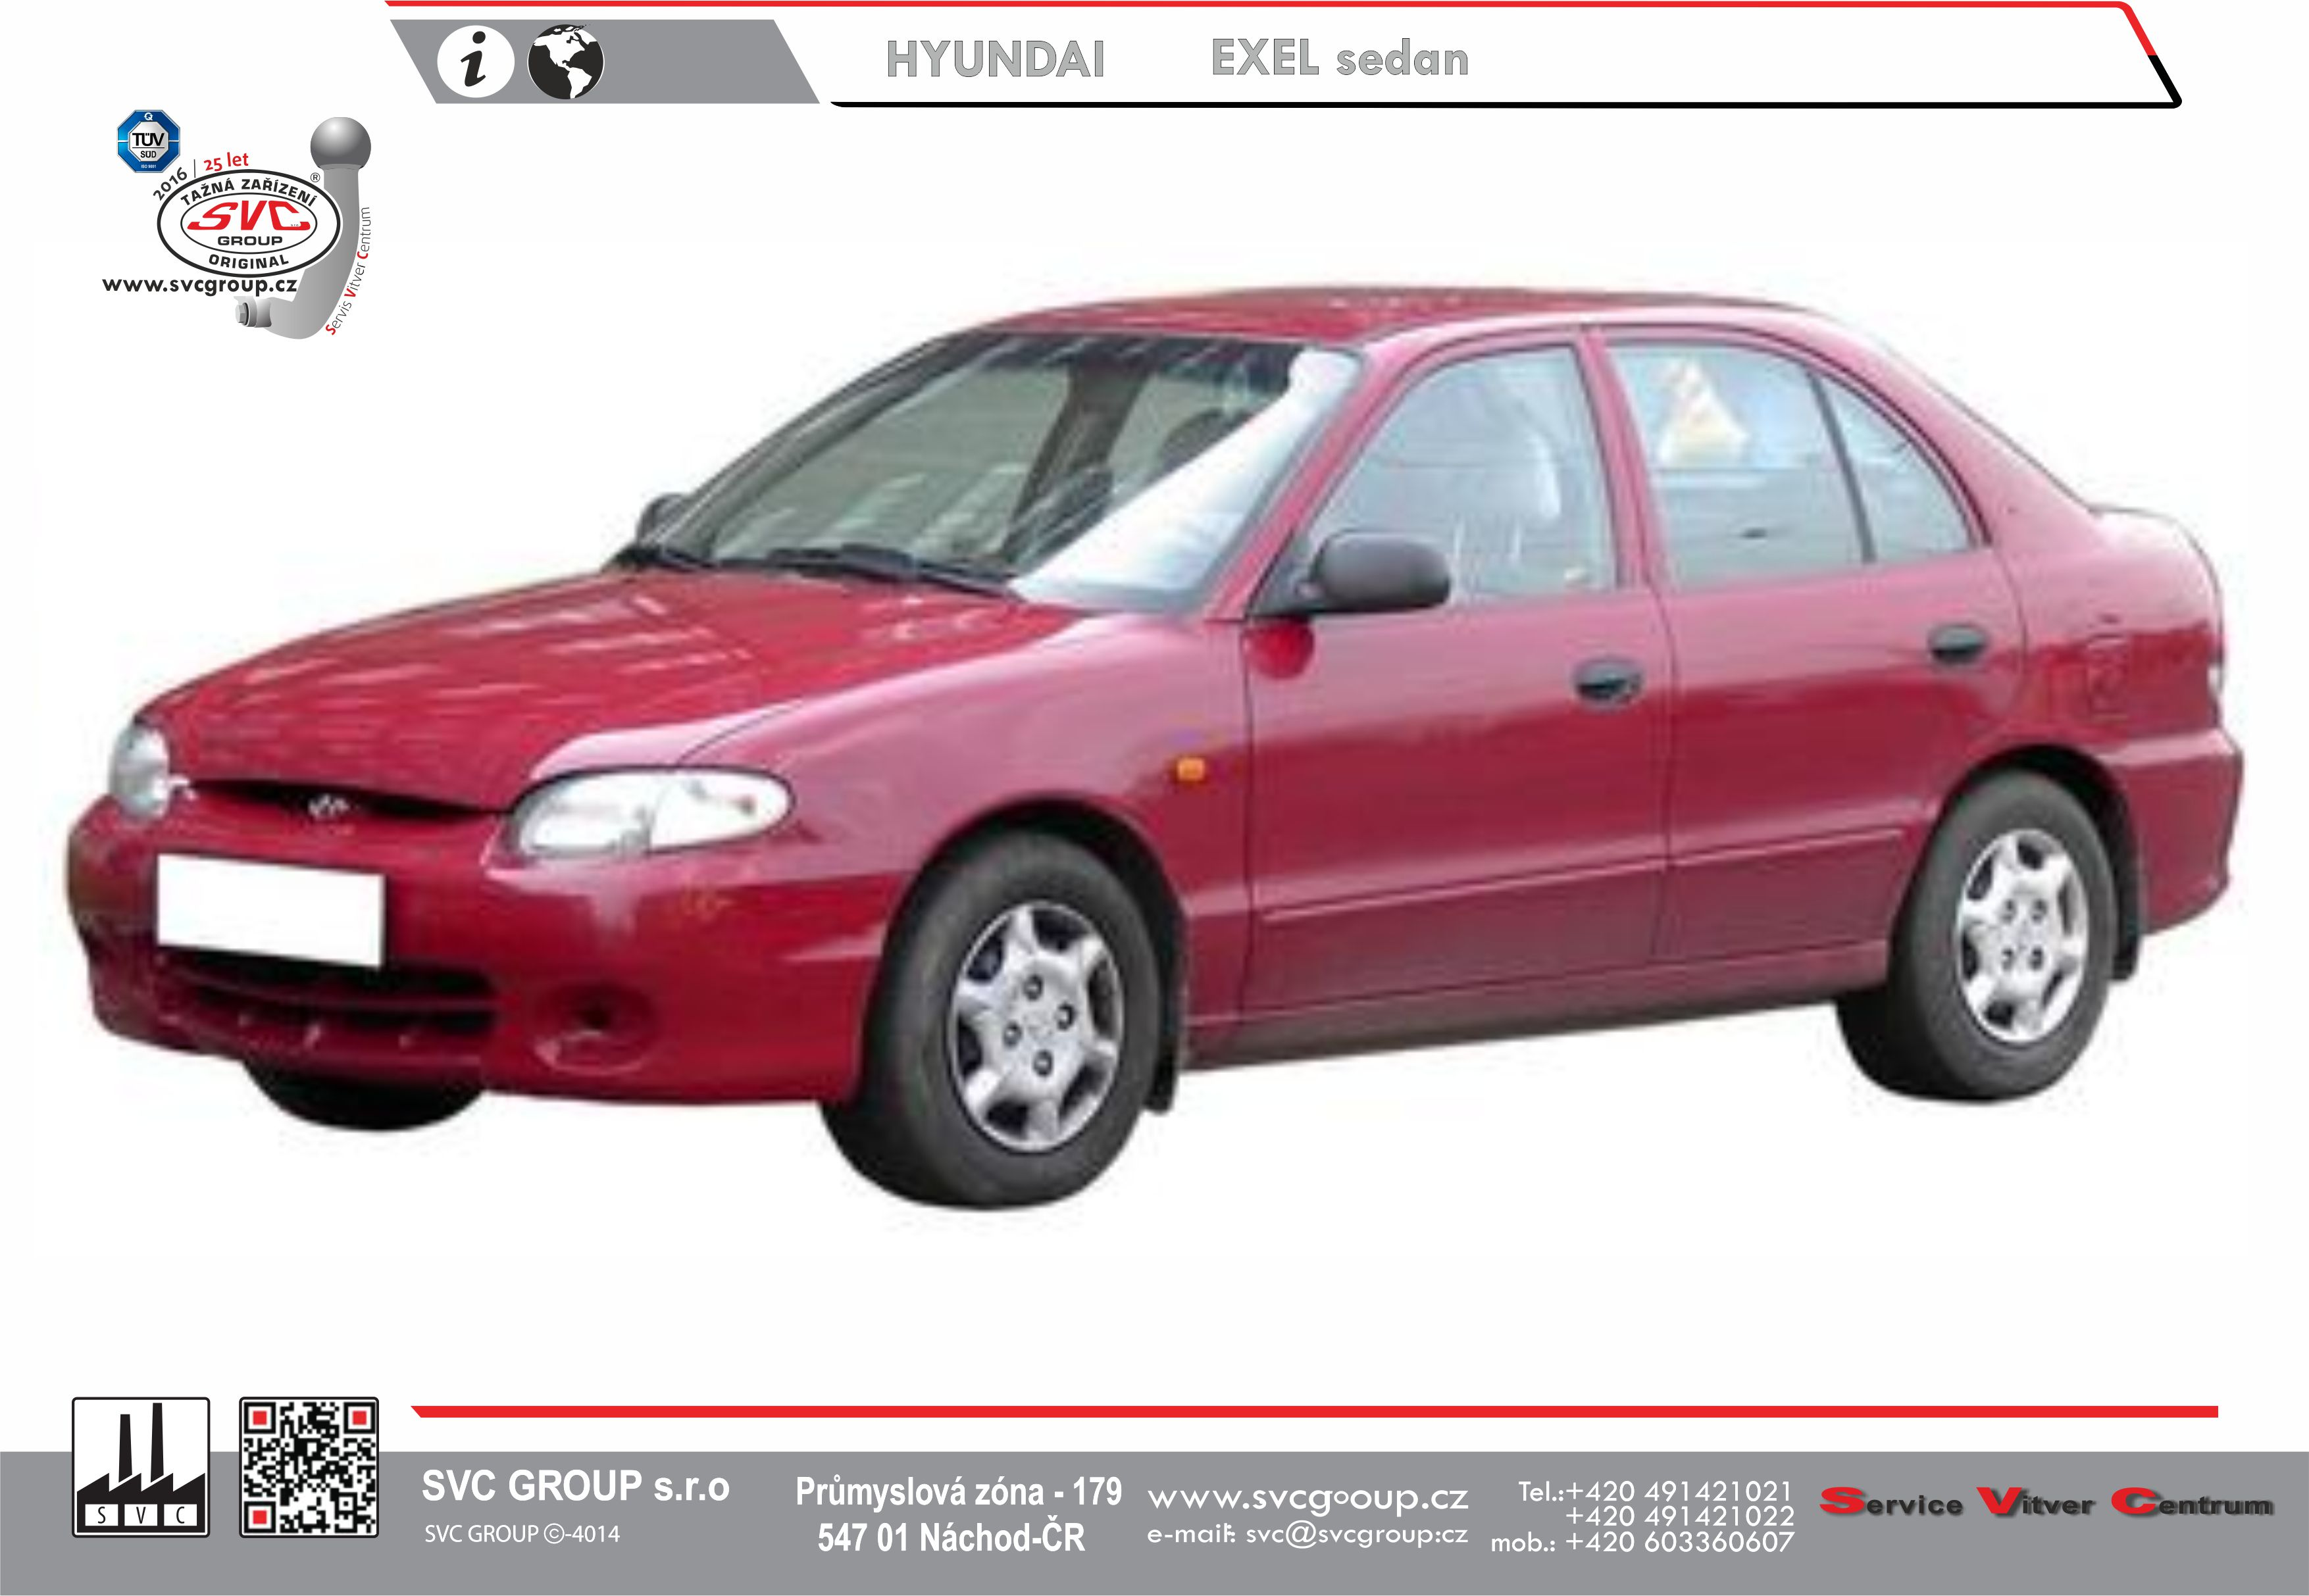 Hyundai Excel Sedan